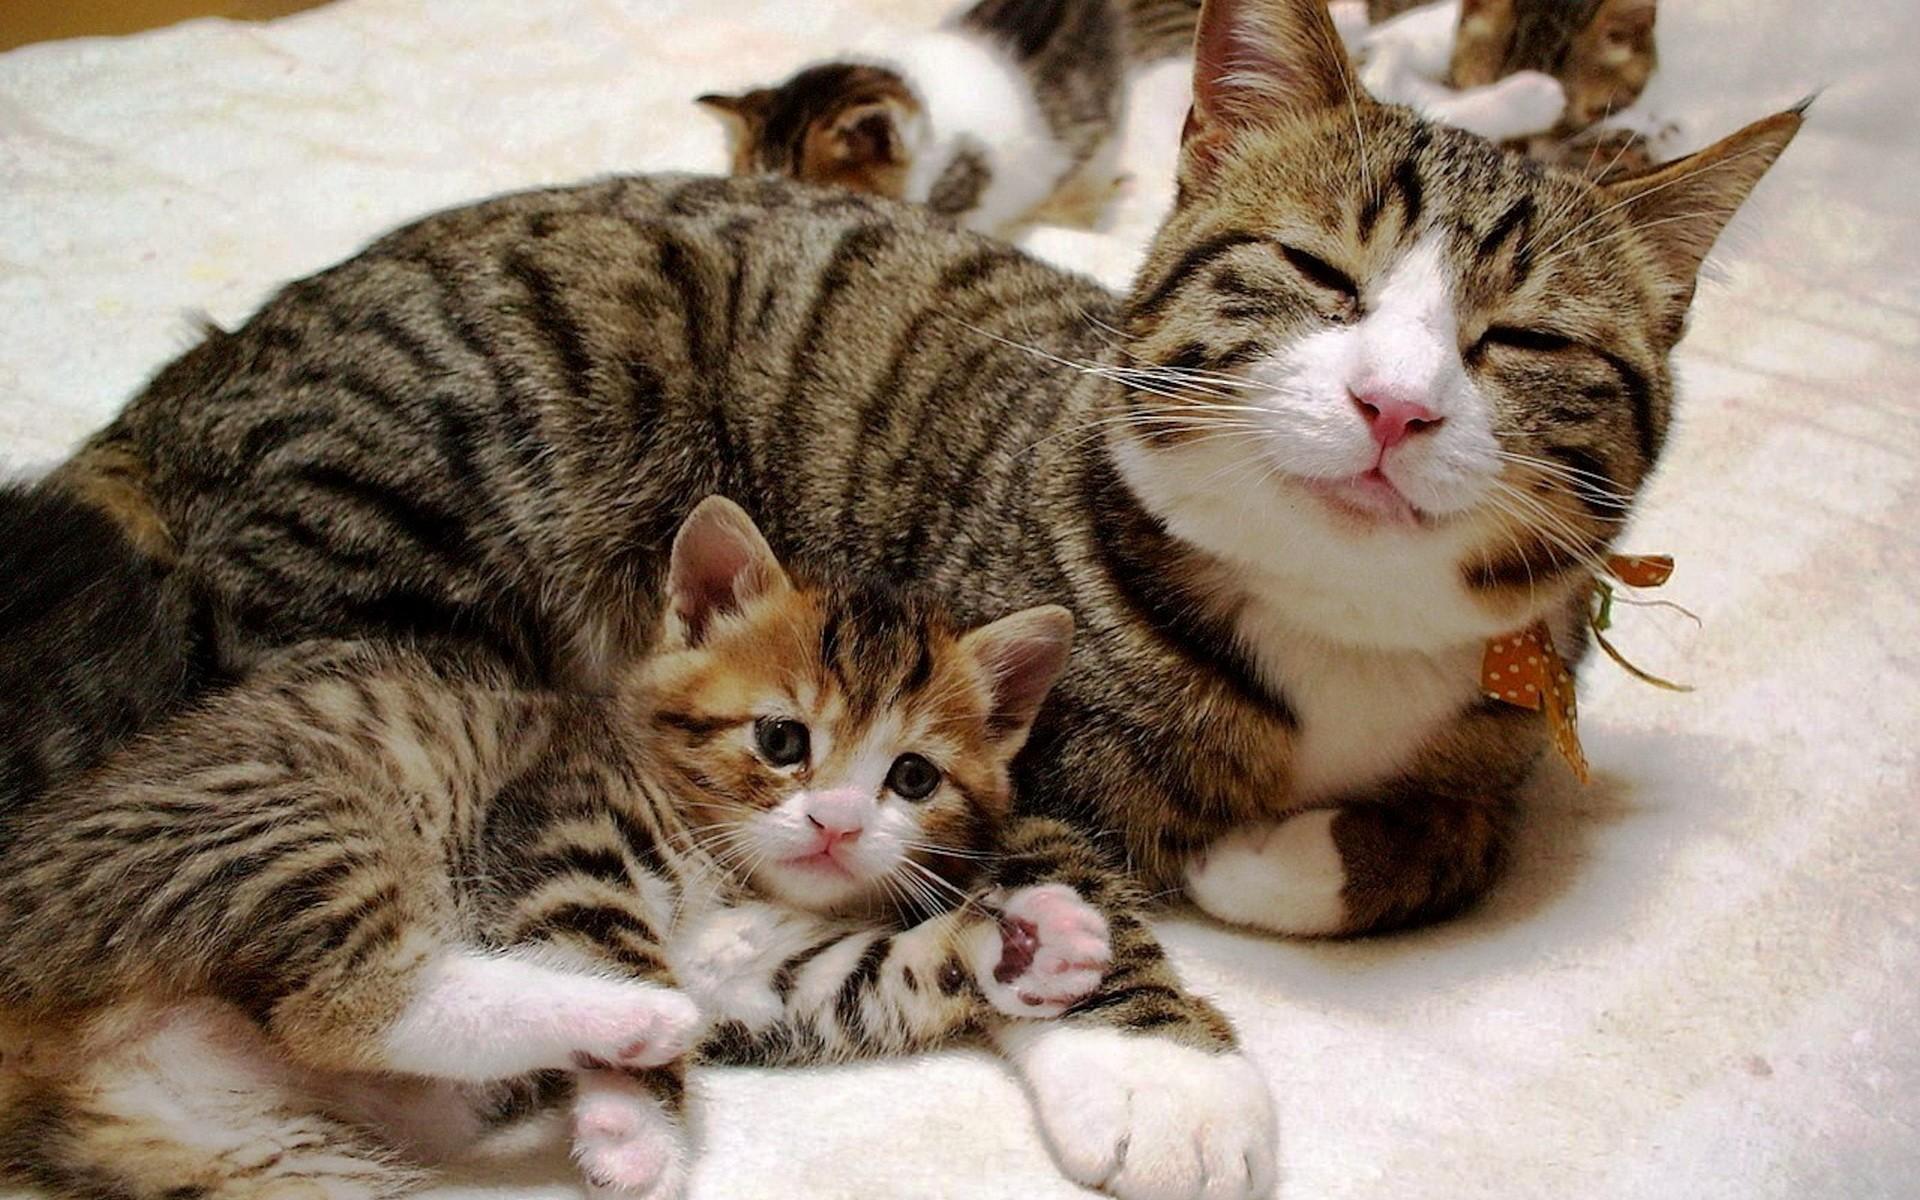 Cute Bengal Cats Wallpaper Taustakuvat El 228 Imet Pennut Poskiparta Villikissa